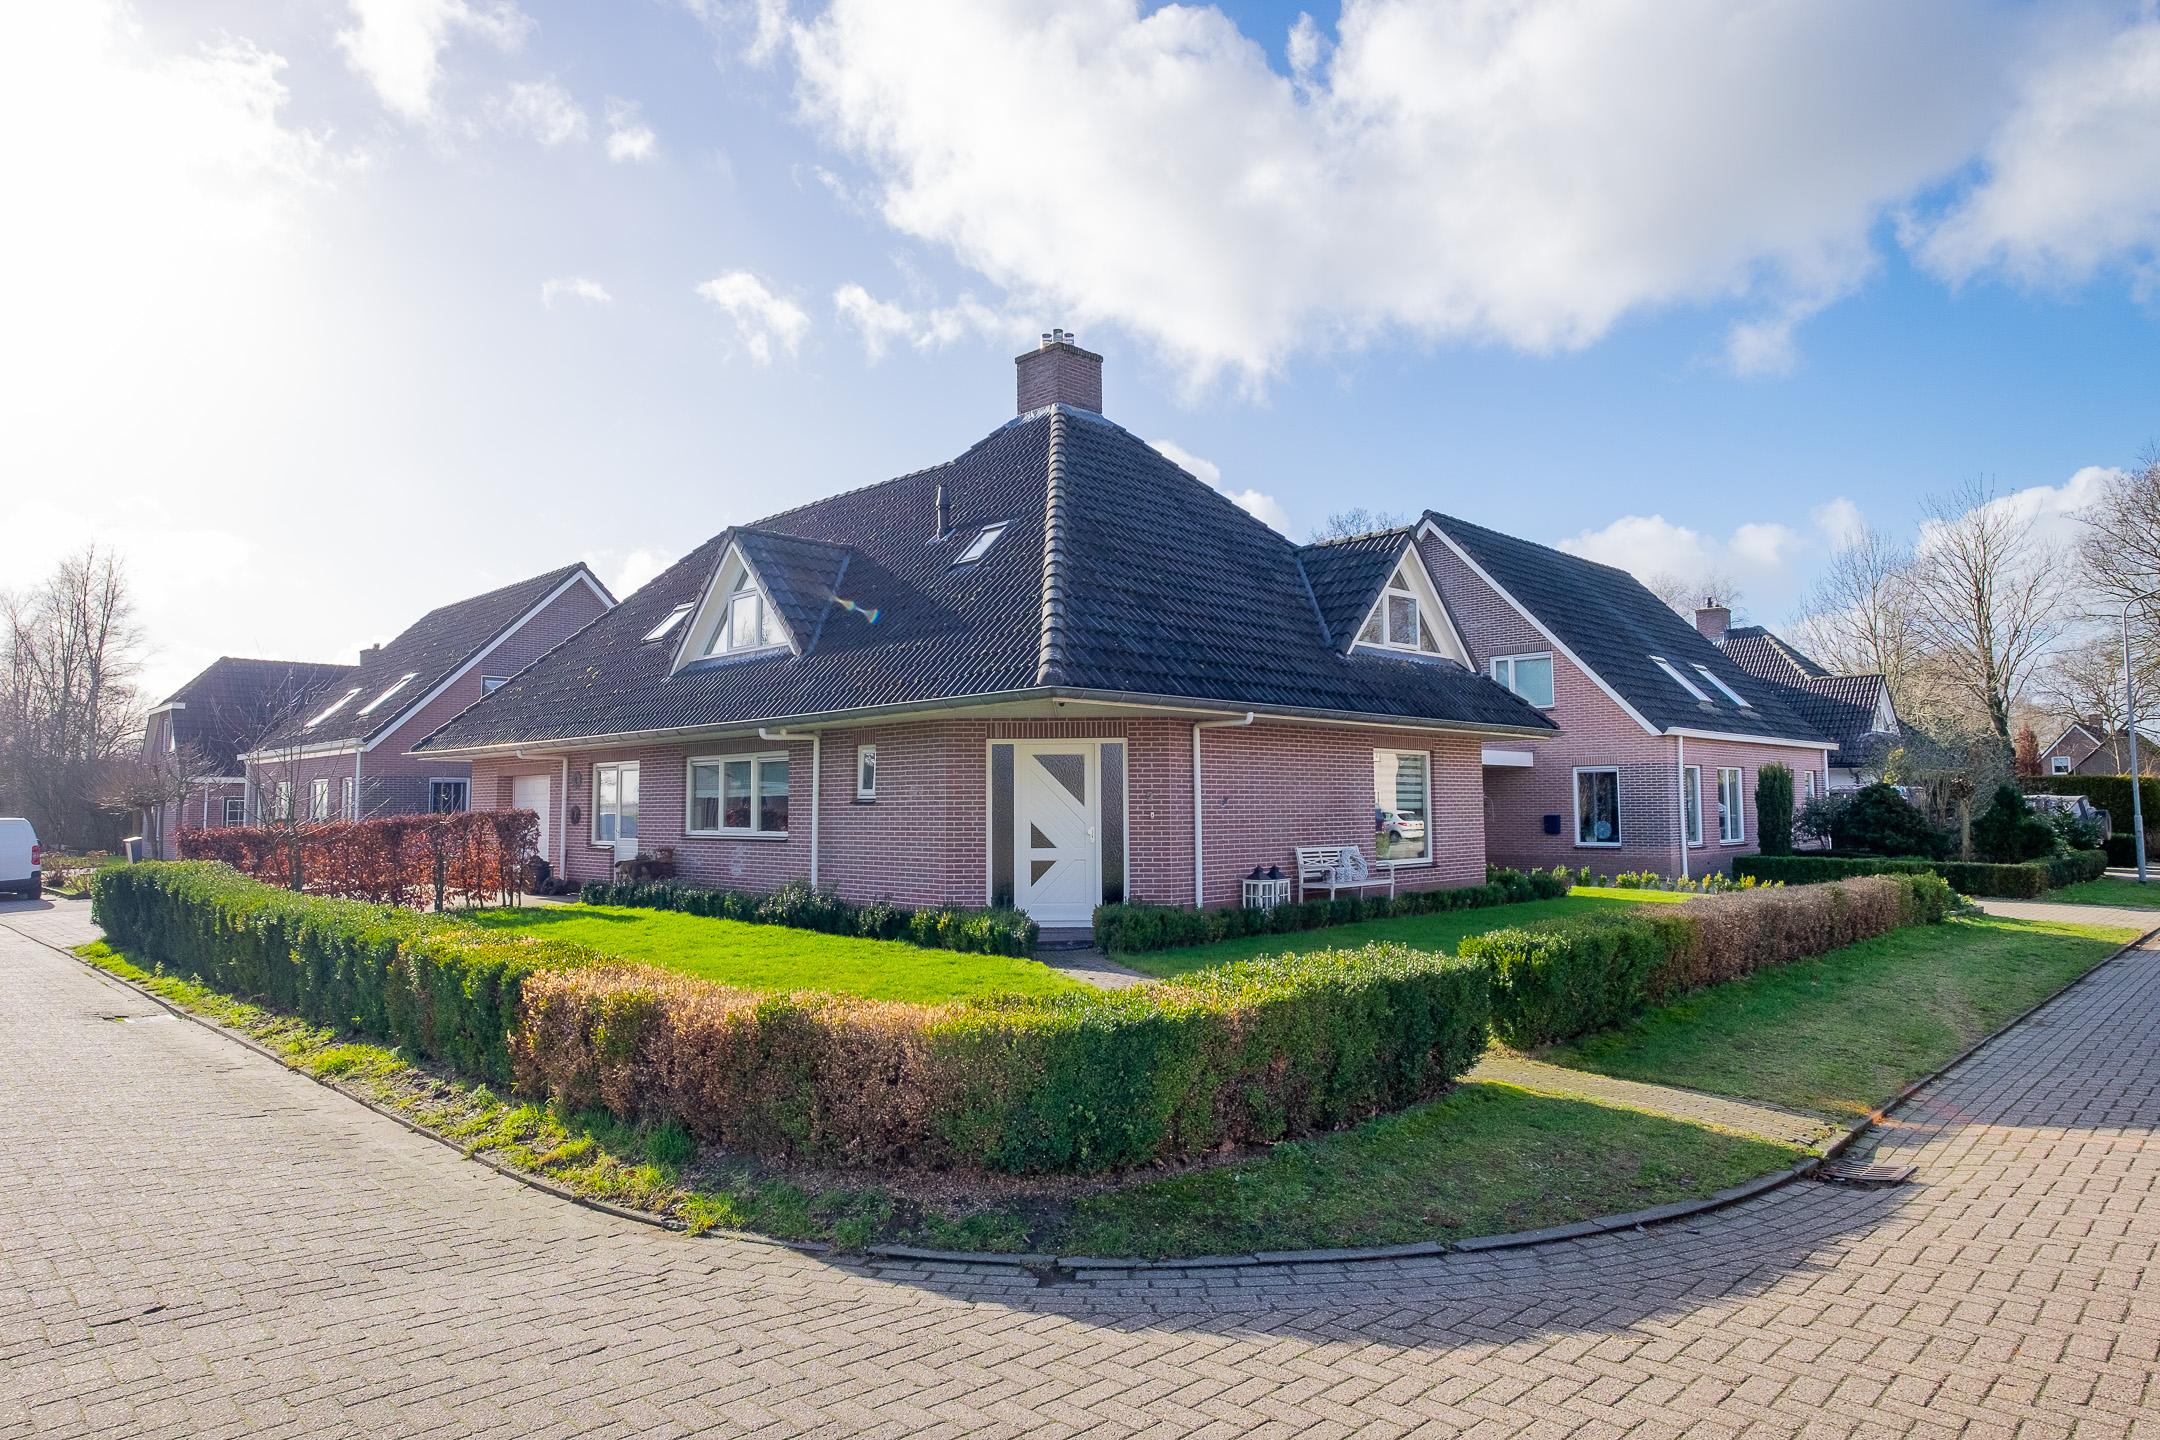 Ir. E. Biewingaweg 2, Witteveen, Drenthe, 2000 Bedrooms Bedrooms, ,6 BadkamerBadkamer,Vrijstaande woning,Te koop,Ir. E. Biewingaweg ,2,1107